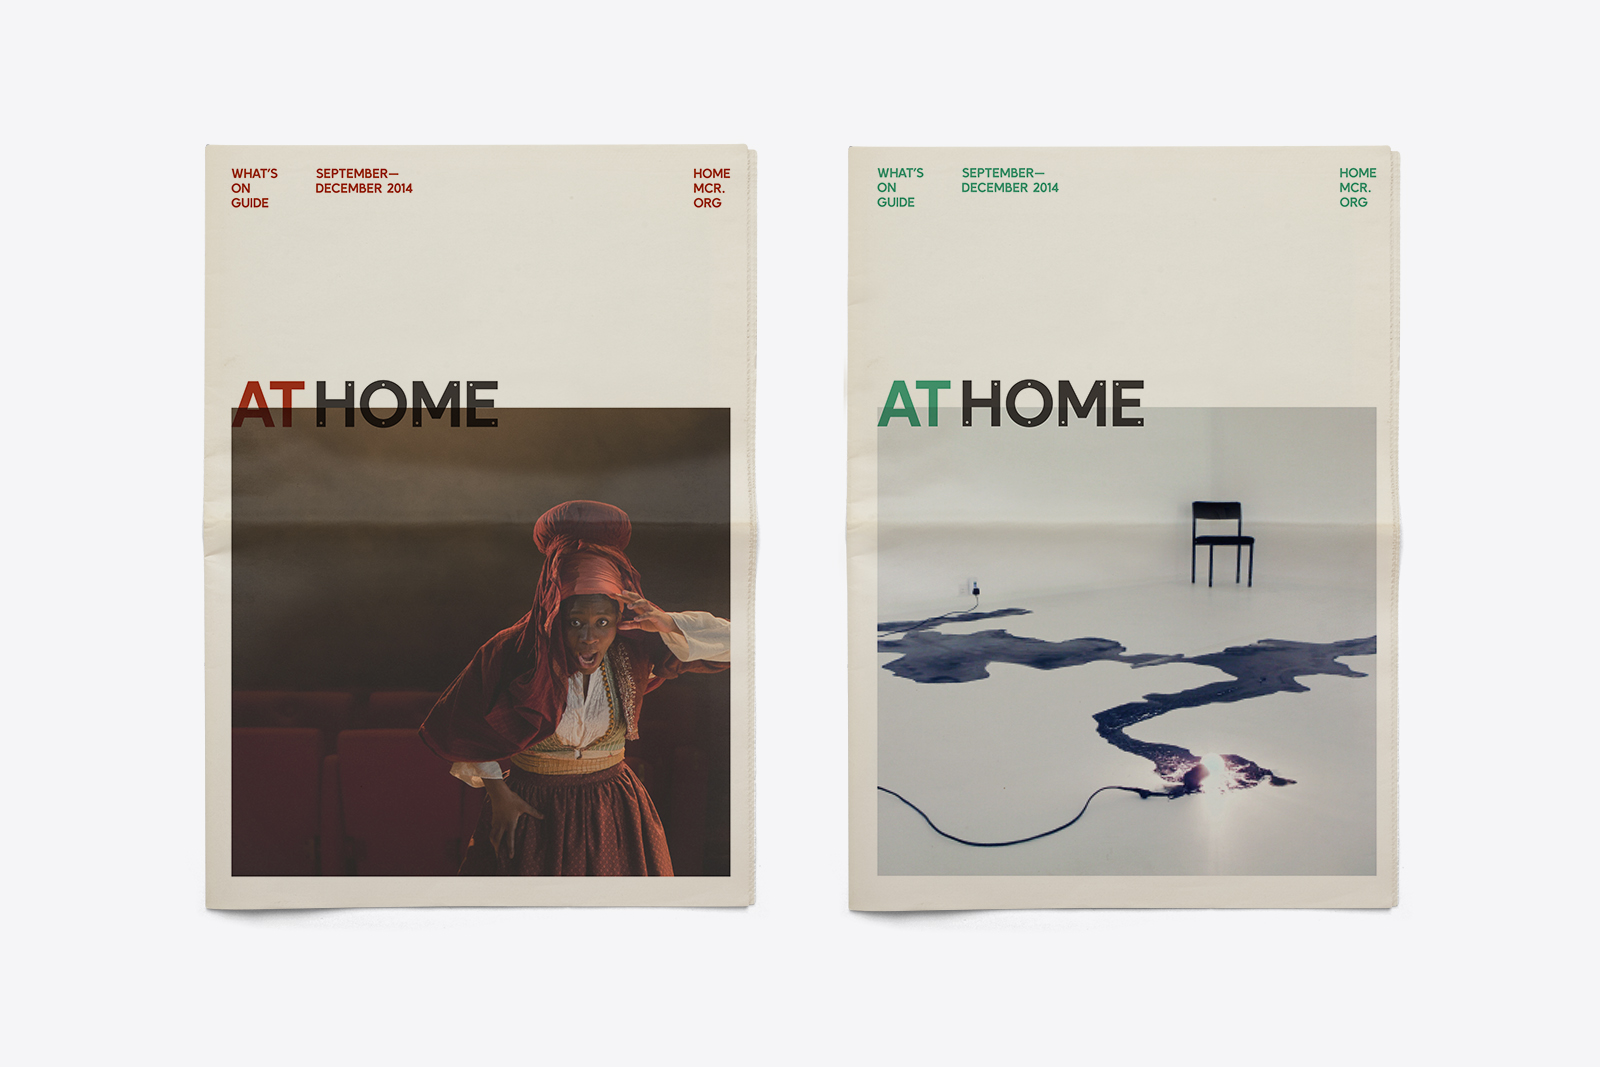 ostreet-HOME-identity-13